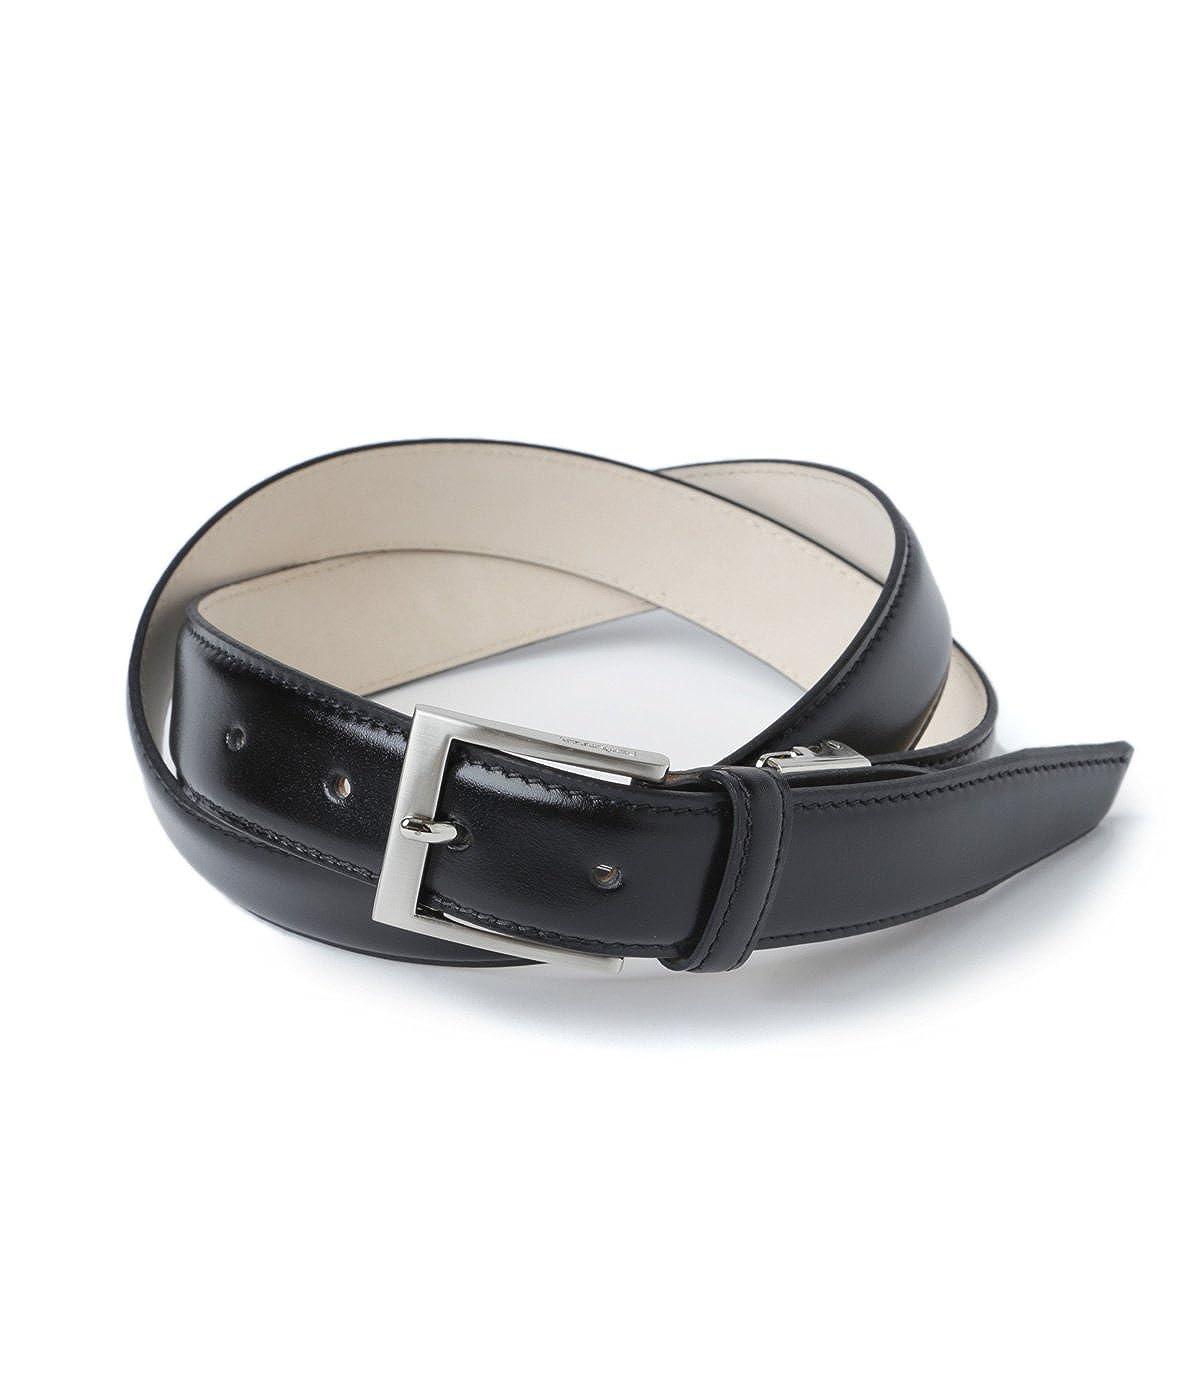 "PVC Elastic Belts Cloth Accessories Plastic Buckle Belts for 24.5~26/"" 1pc"